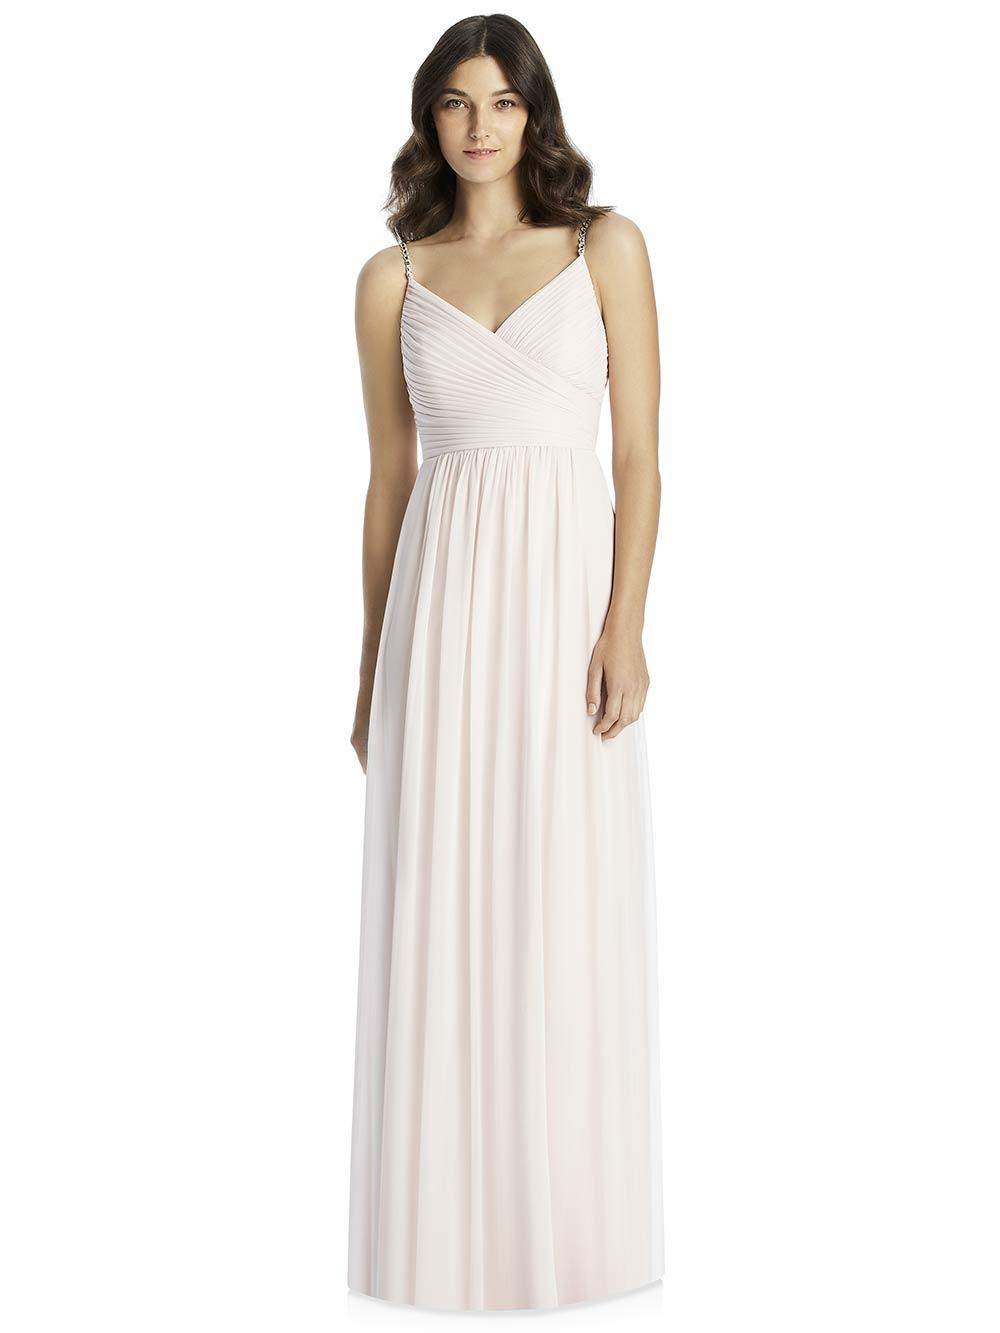 bridesmaid-dresses-dessy-27174